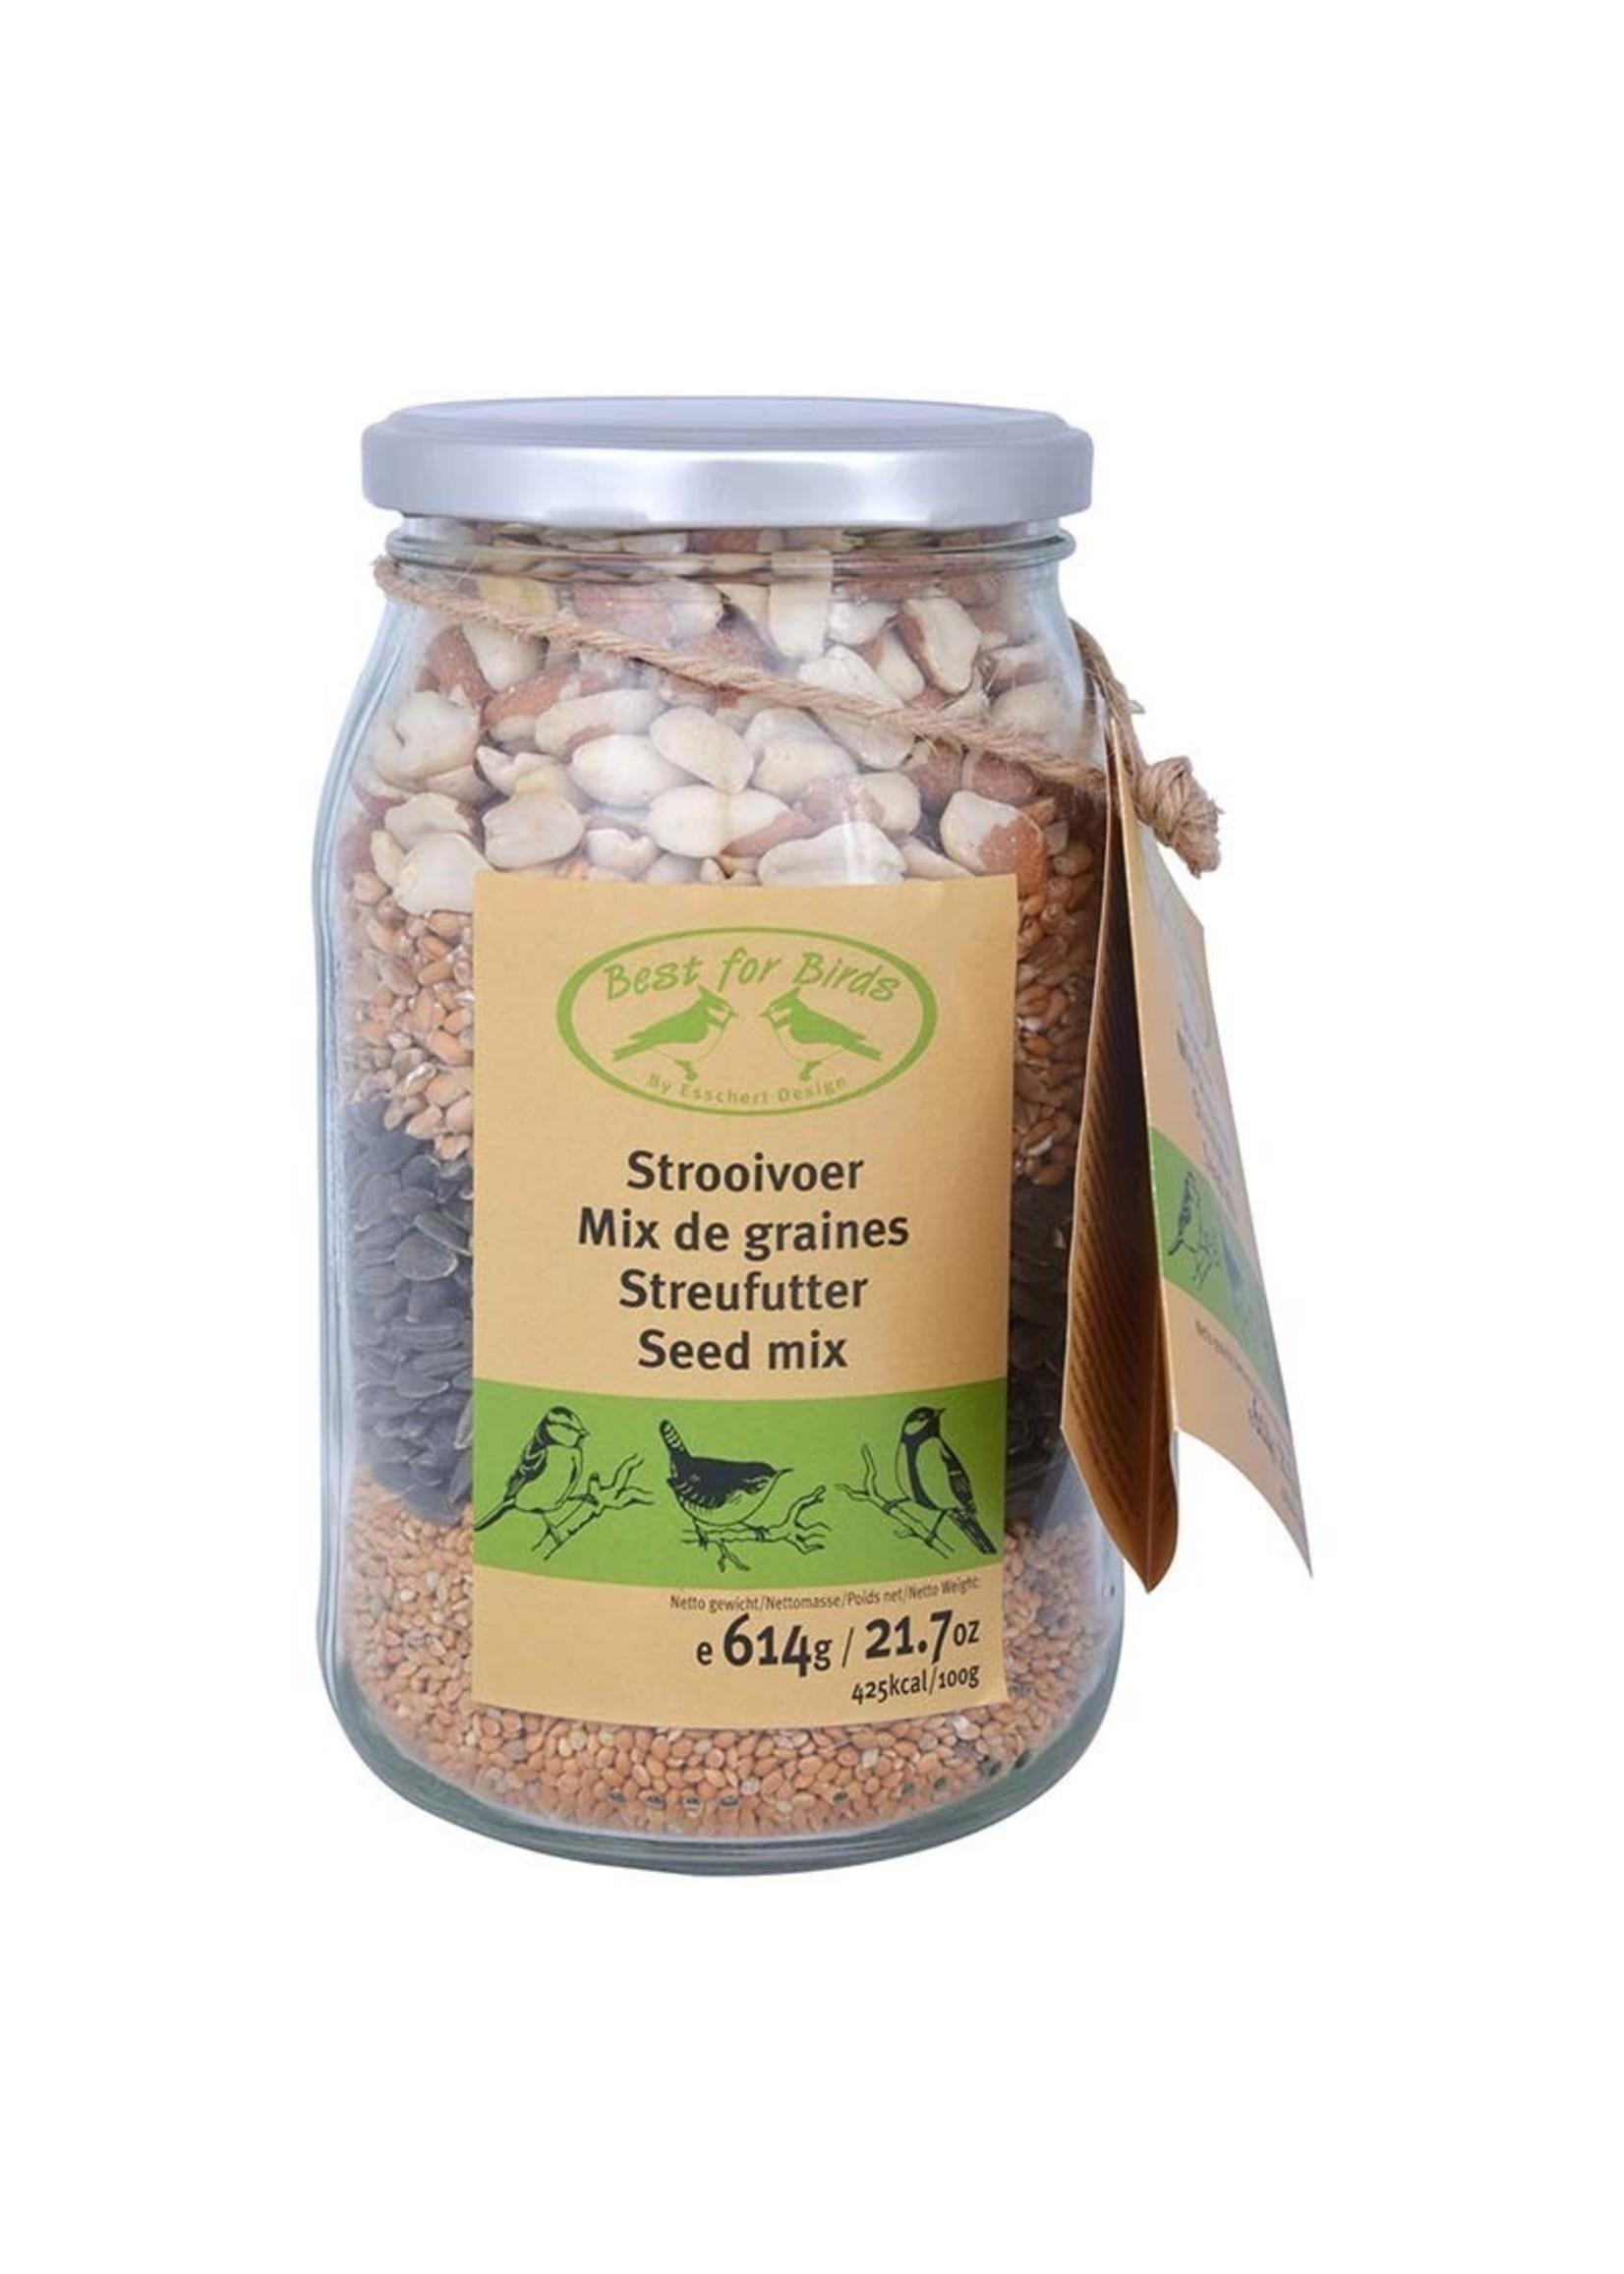 Bird seed mix in glass jar